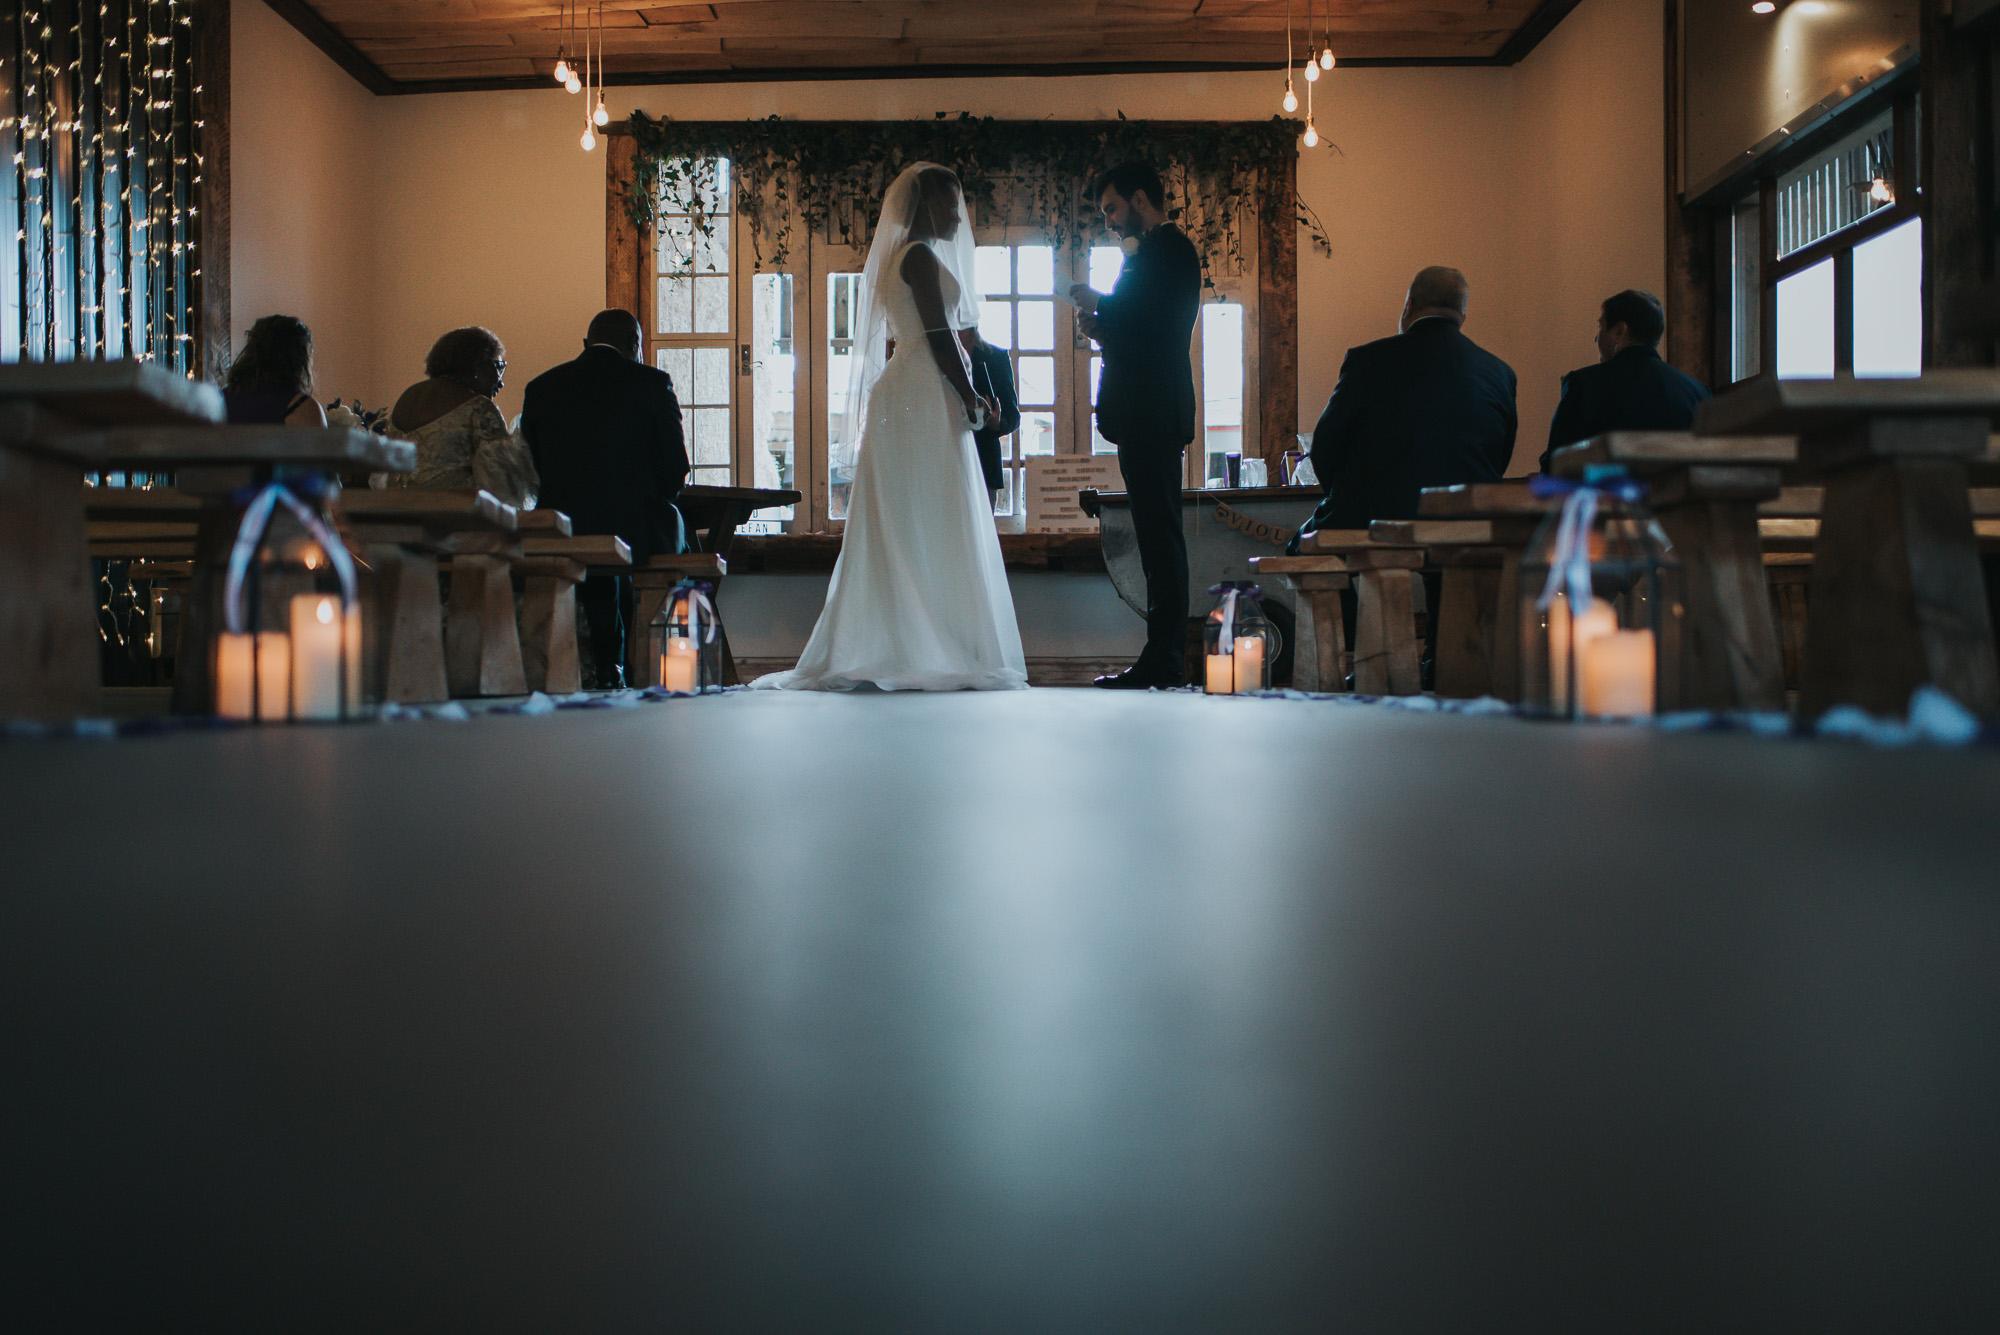 Owen HOuse Wedding Barn WEdding Photographer cheshire adam joe roberts photography (14 of 36).jpg